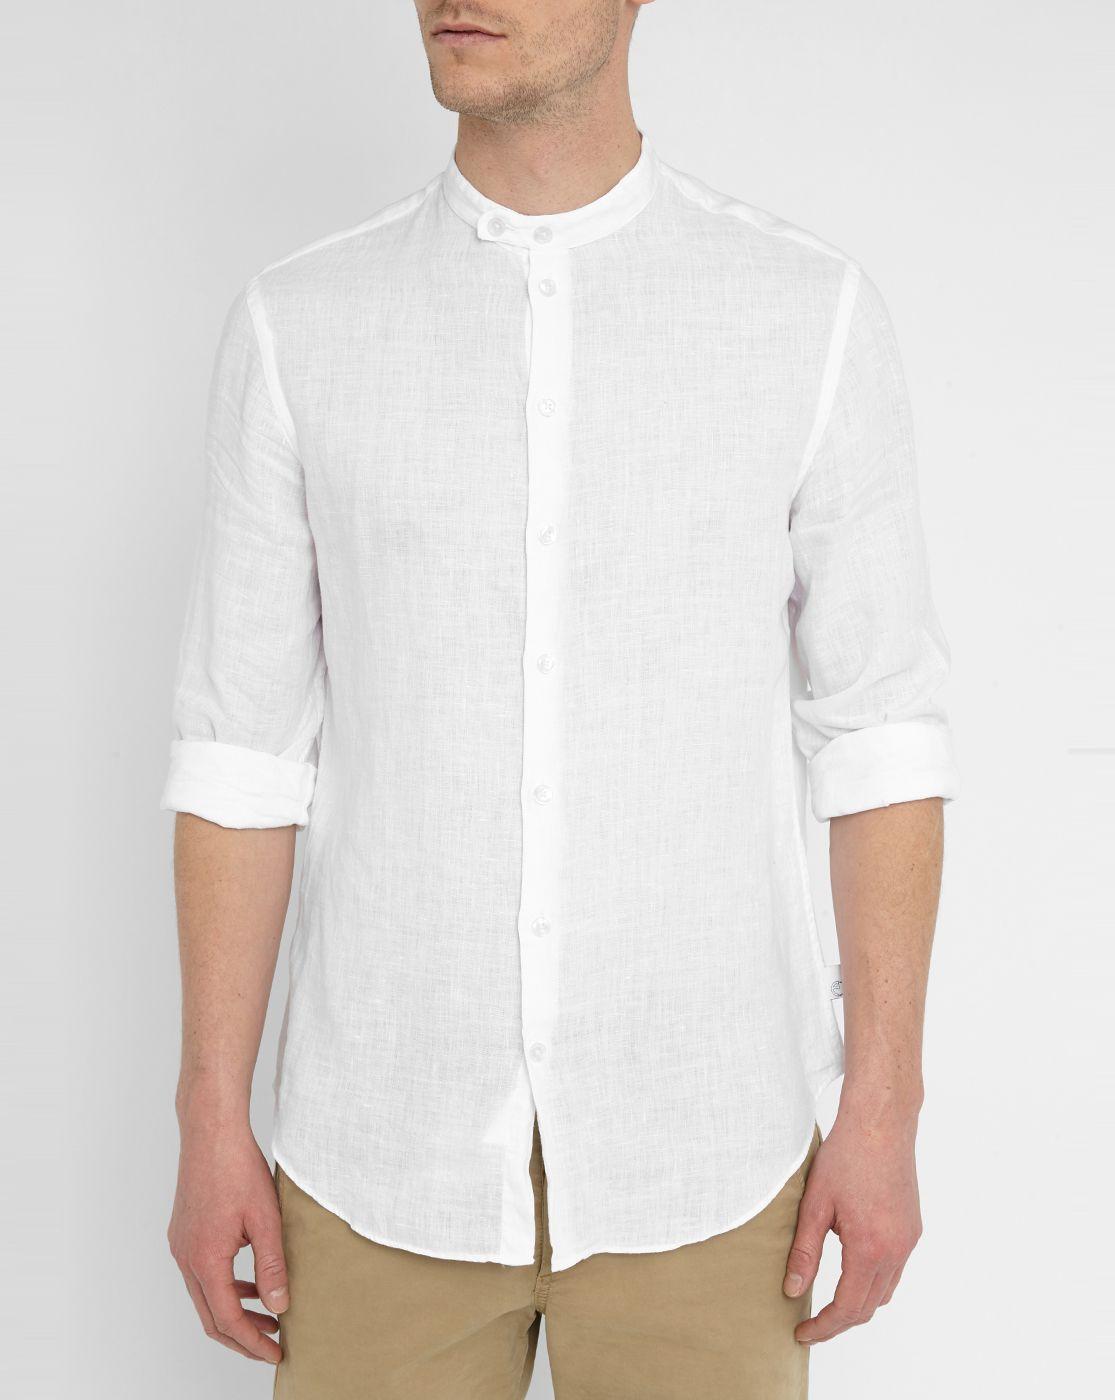 ec836aa8a White Mandarin Collar Linen Shirt | Places to Visit | Shirts ...